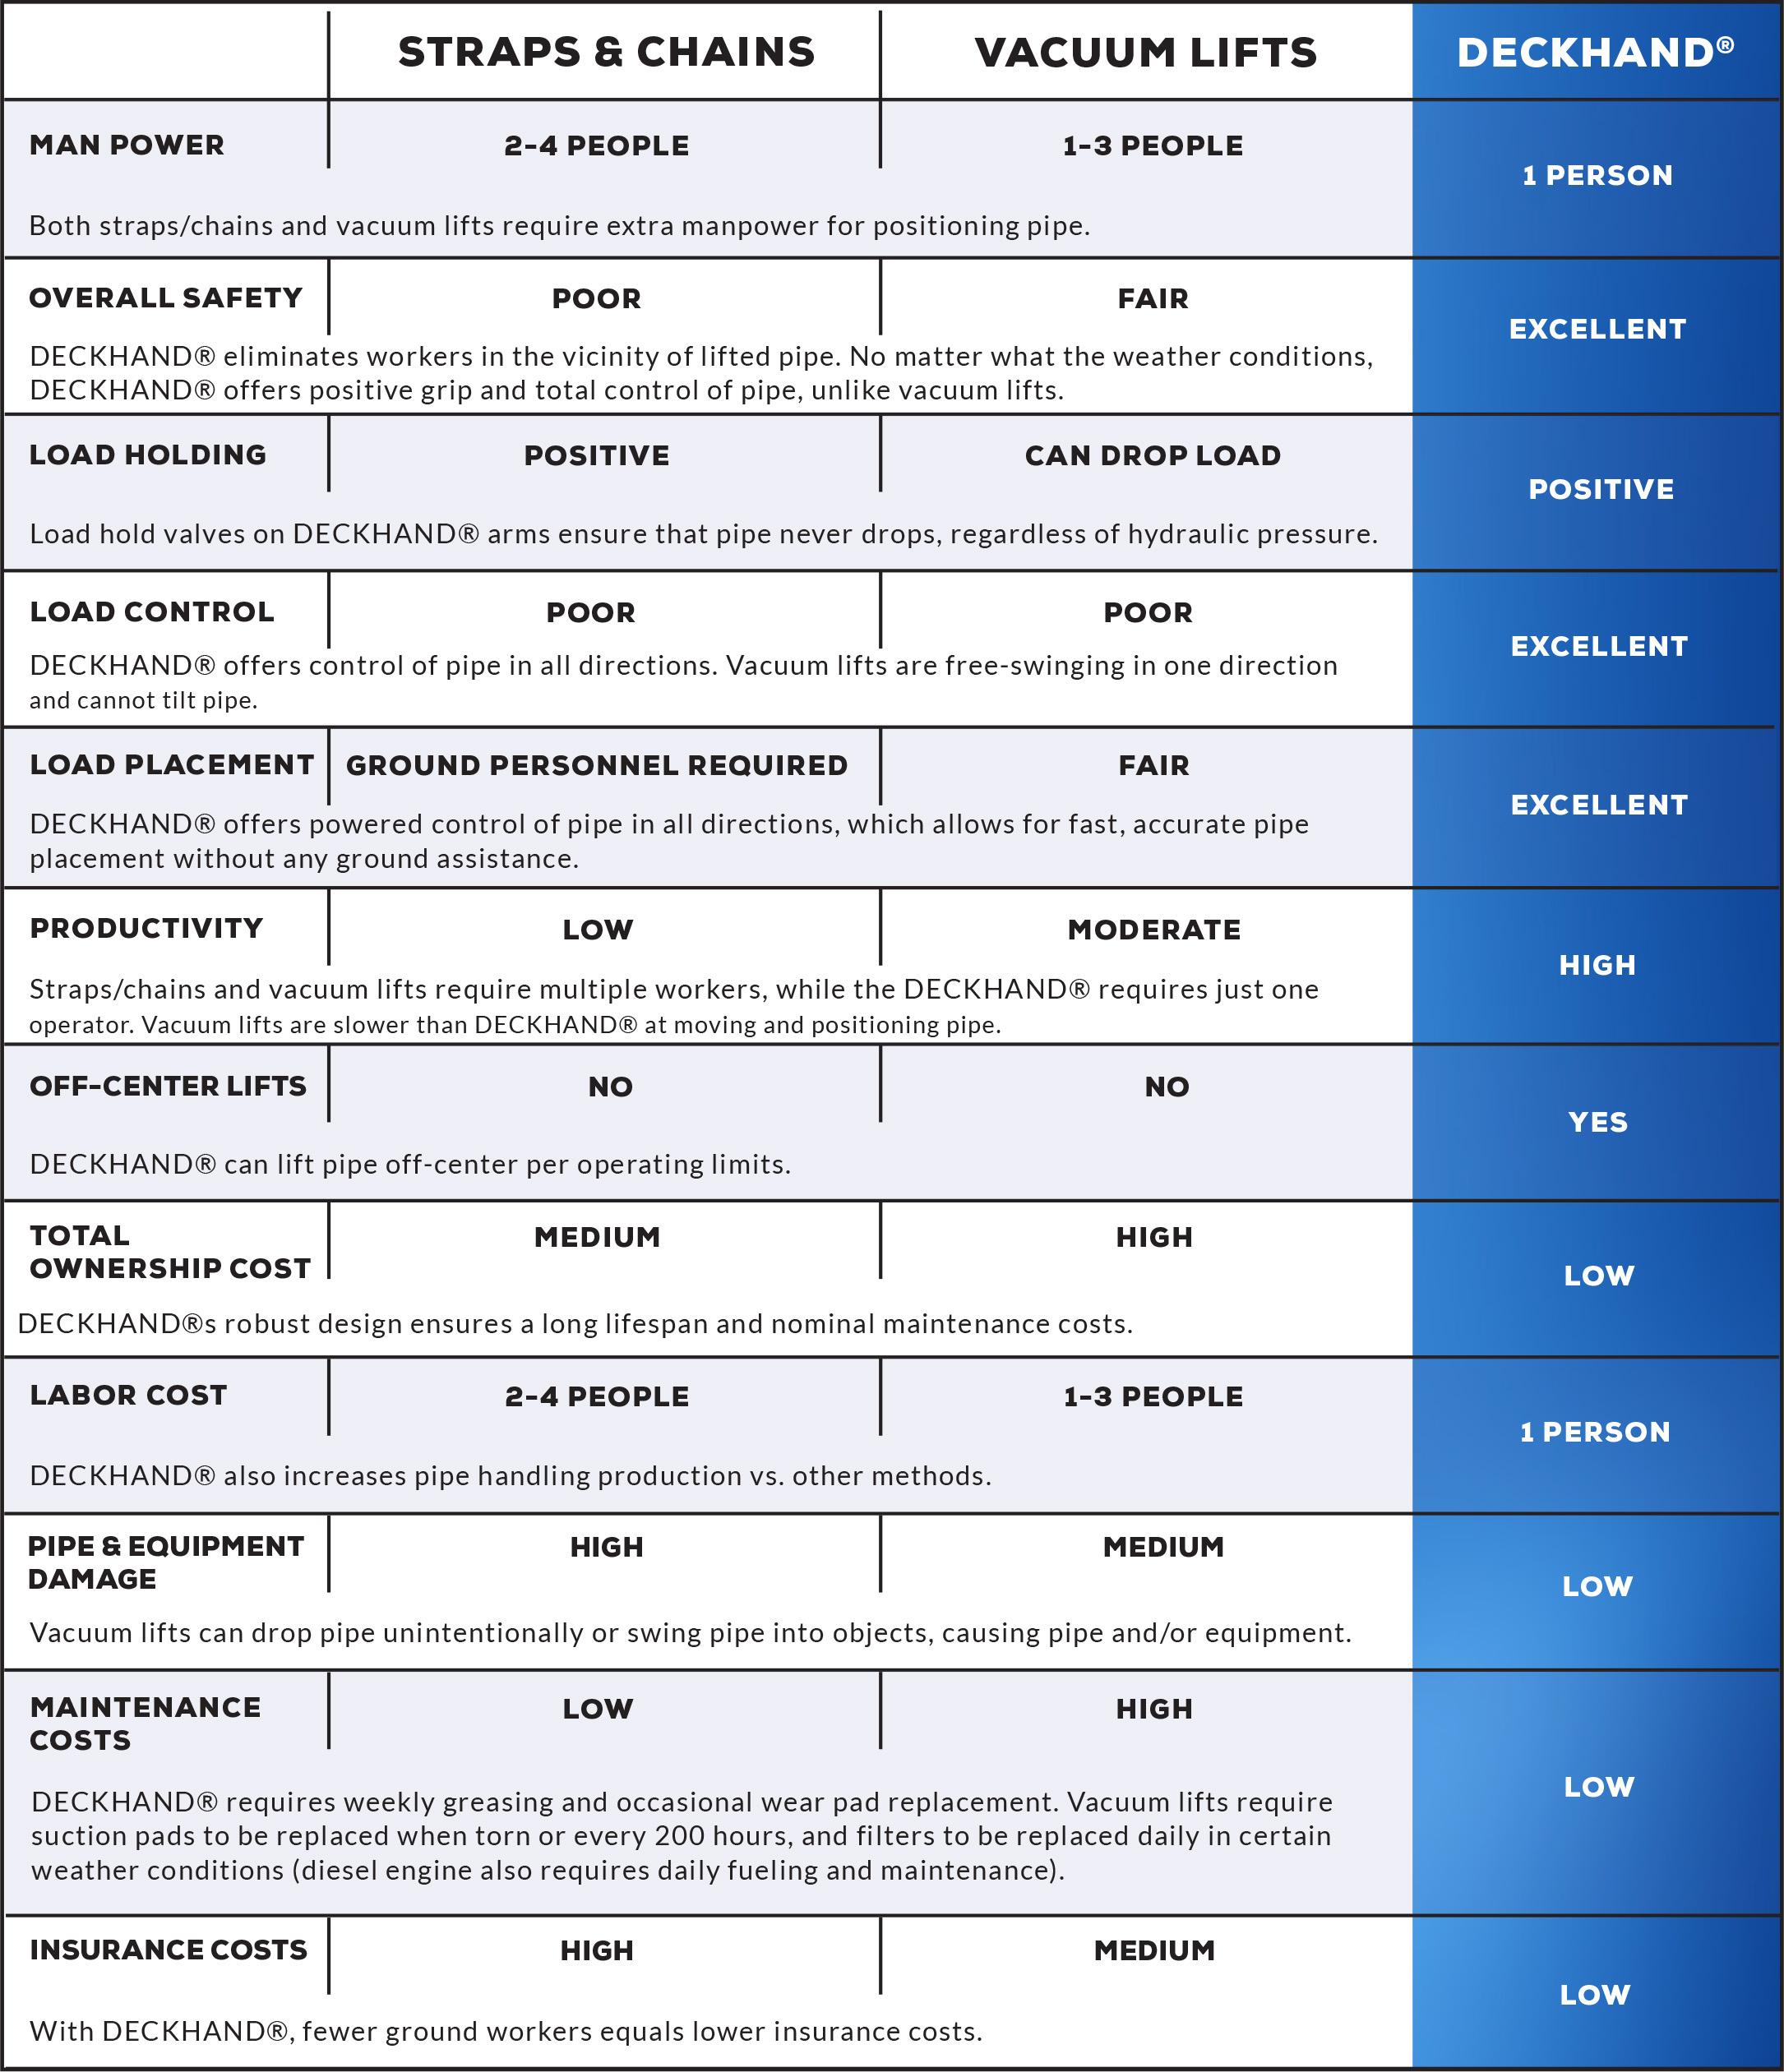 deckhand-comparison-chart